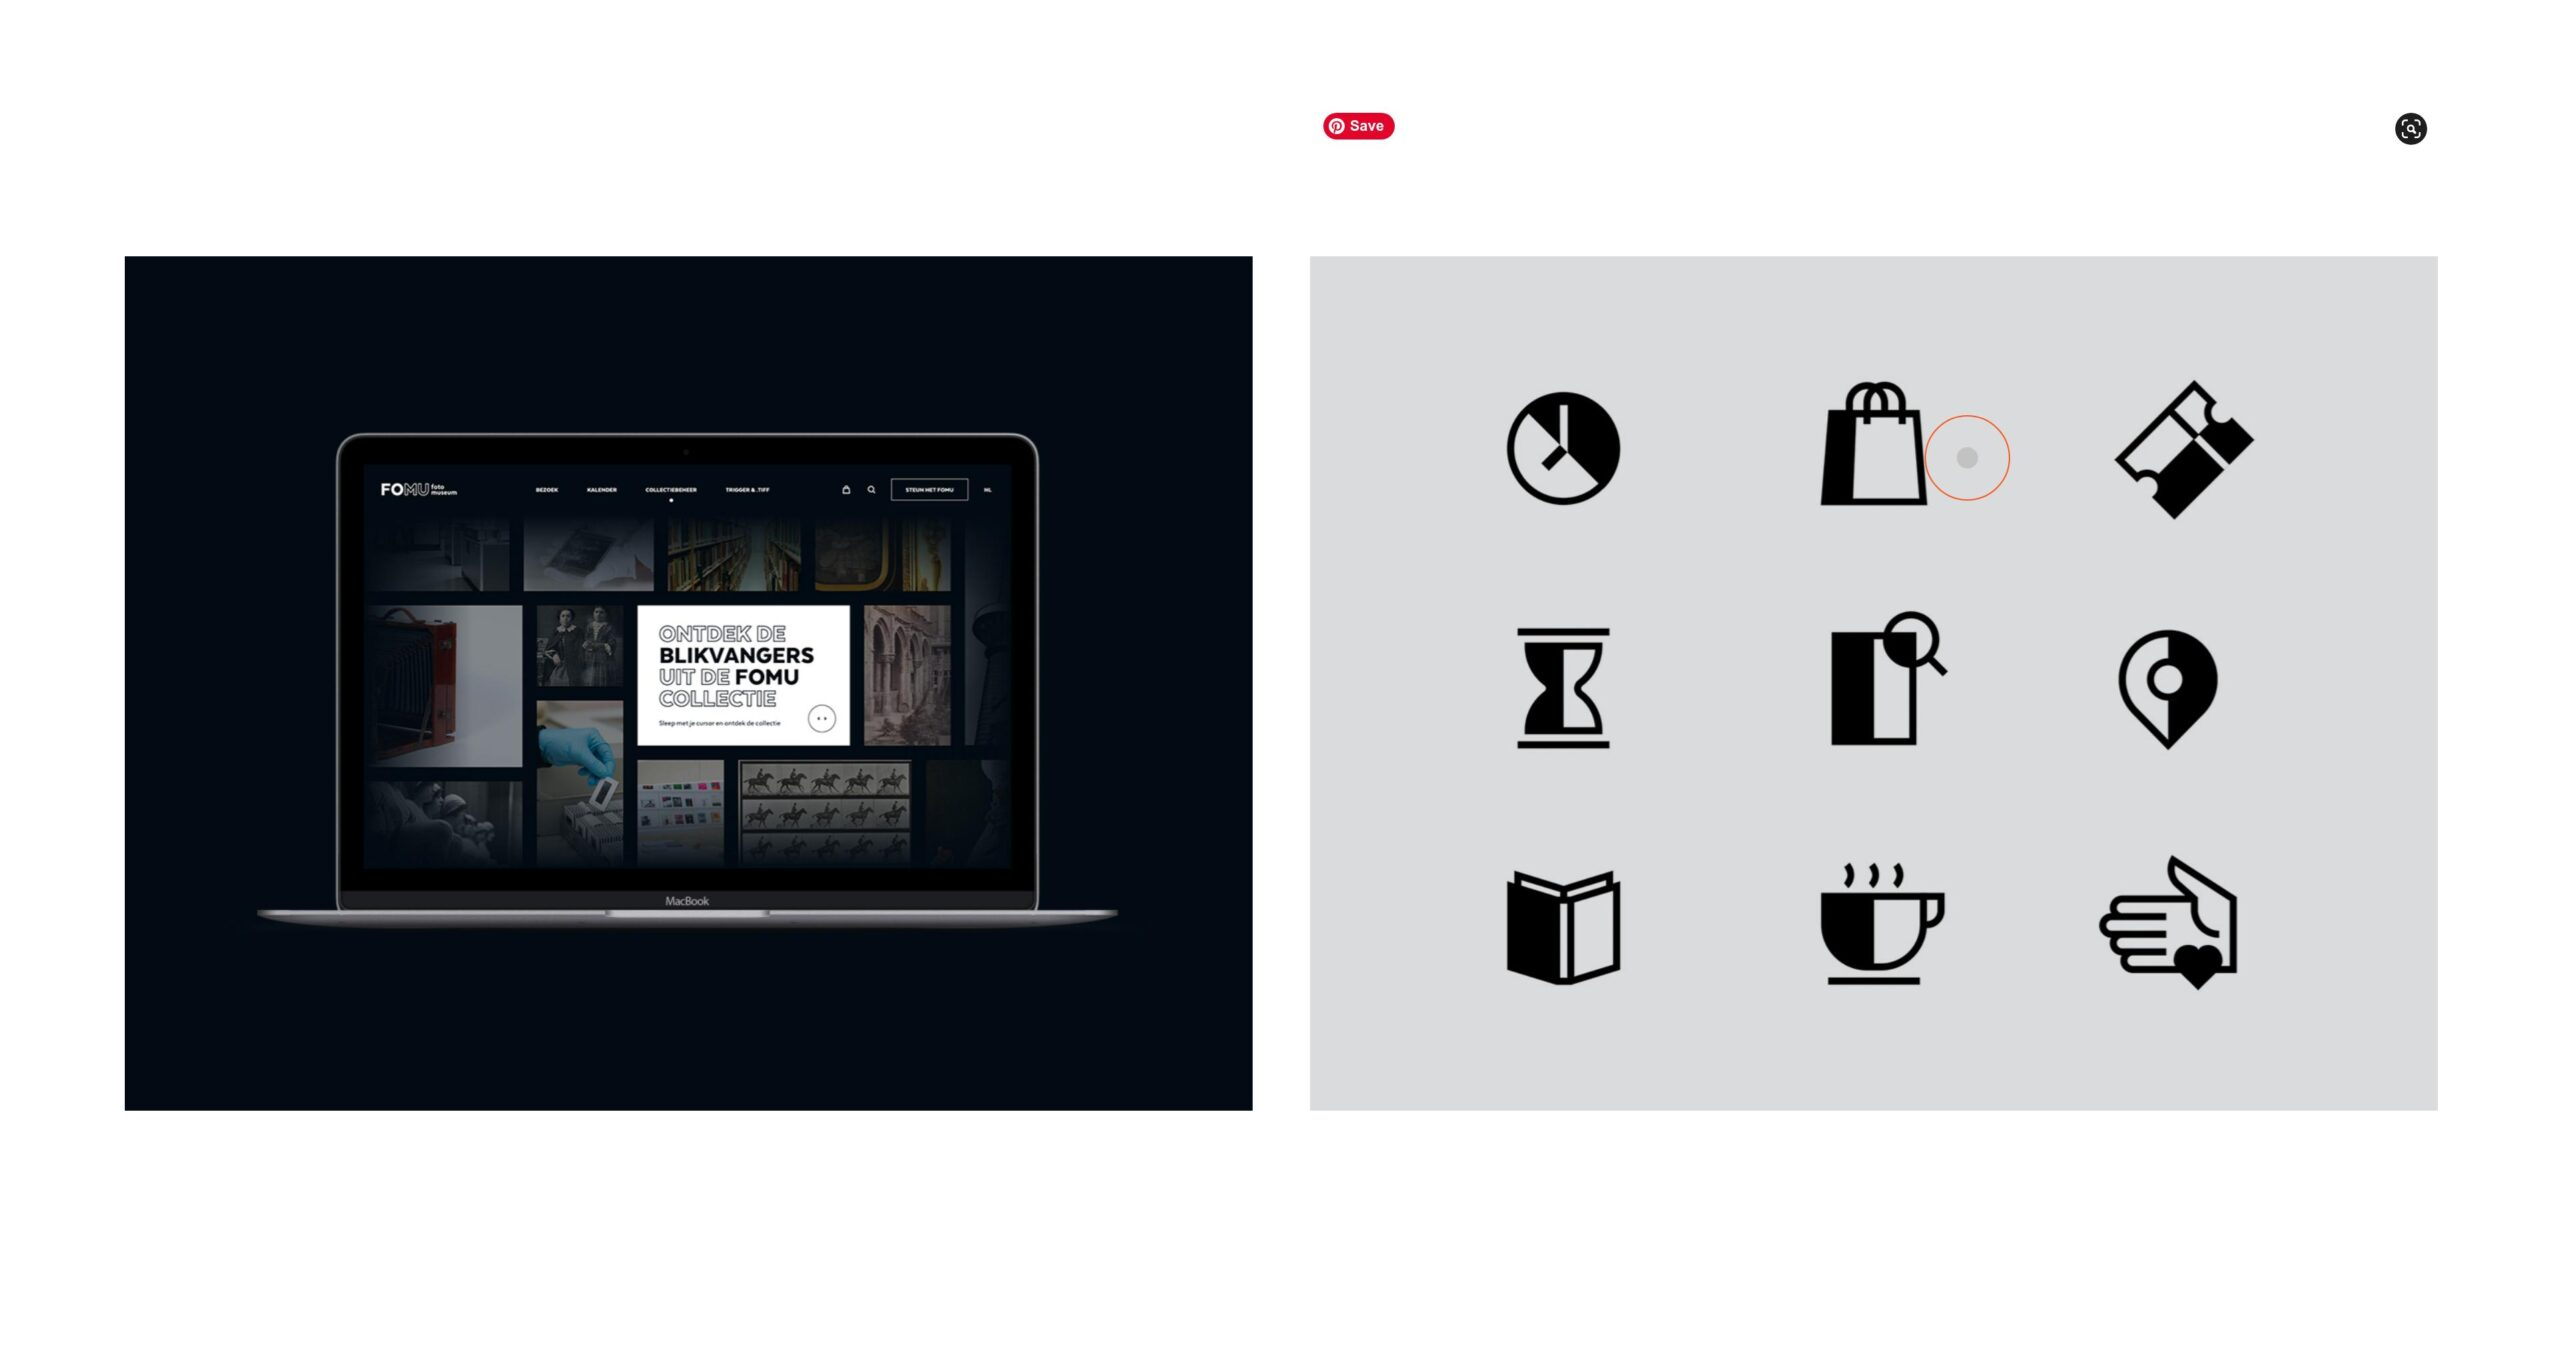 Orpetron Web Design Awards - Lunar - Web Design Awards Inspiration Trends UI UX